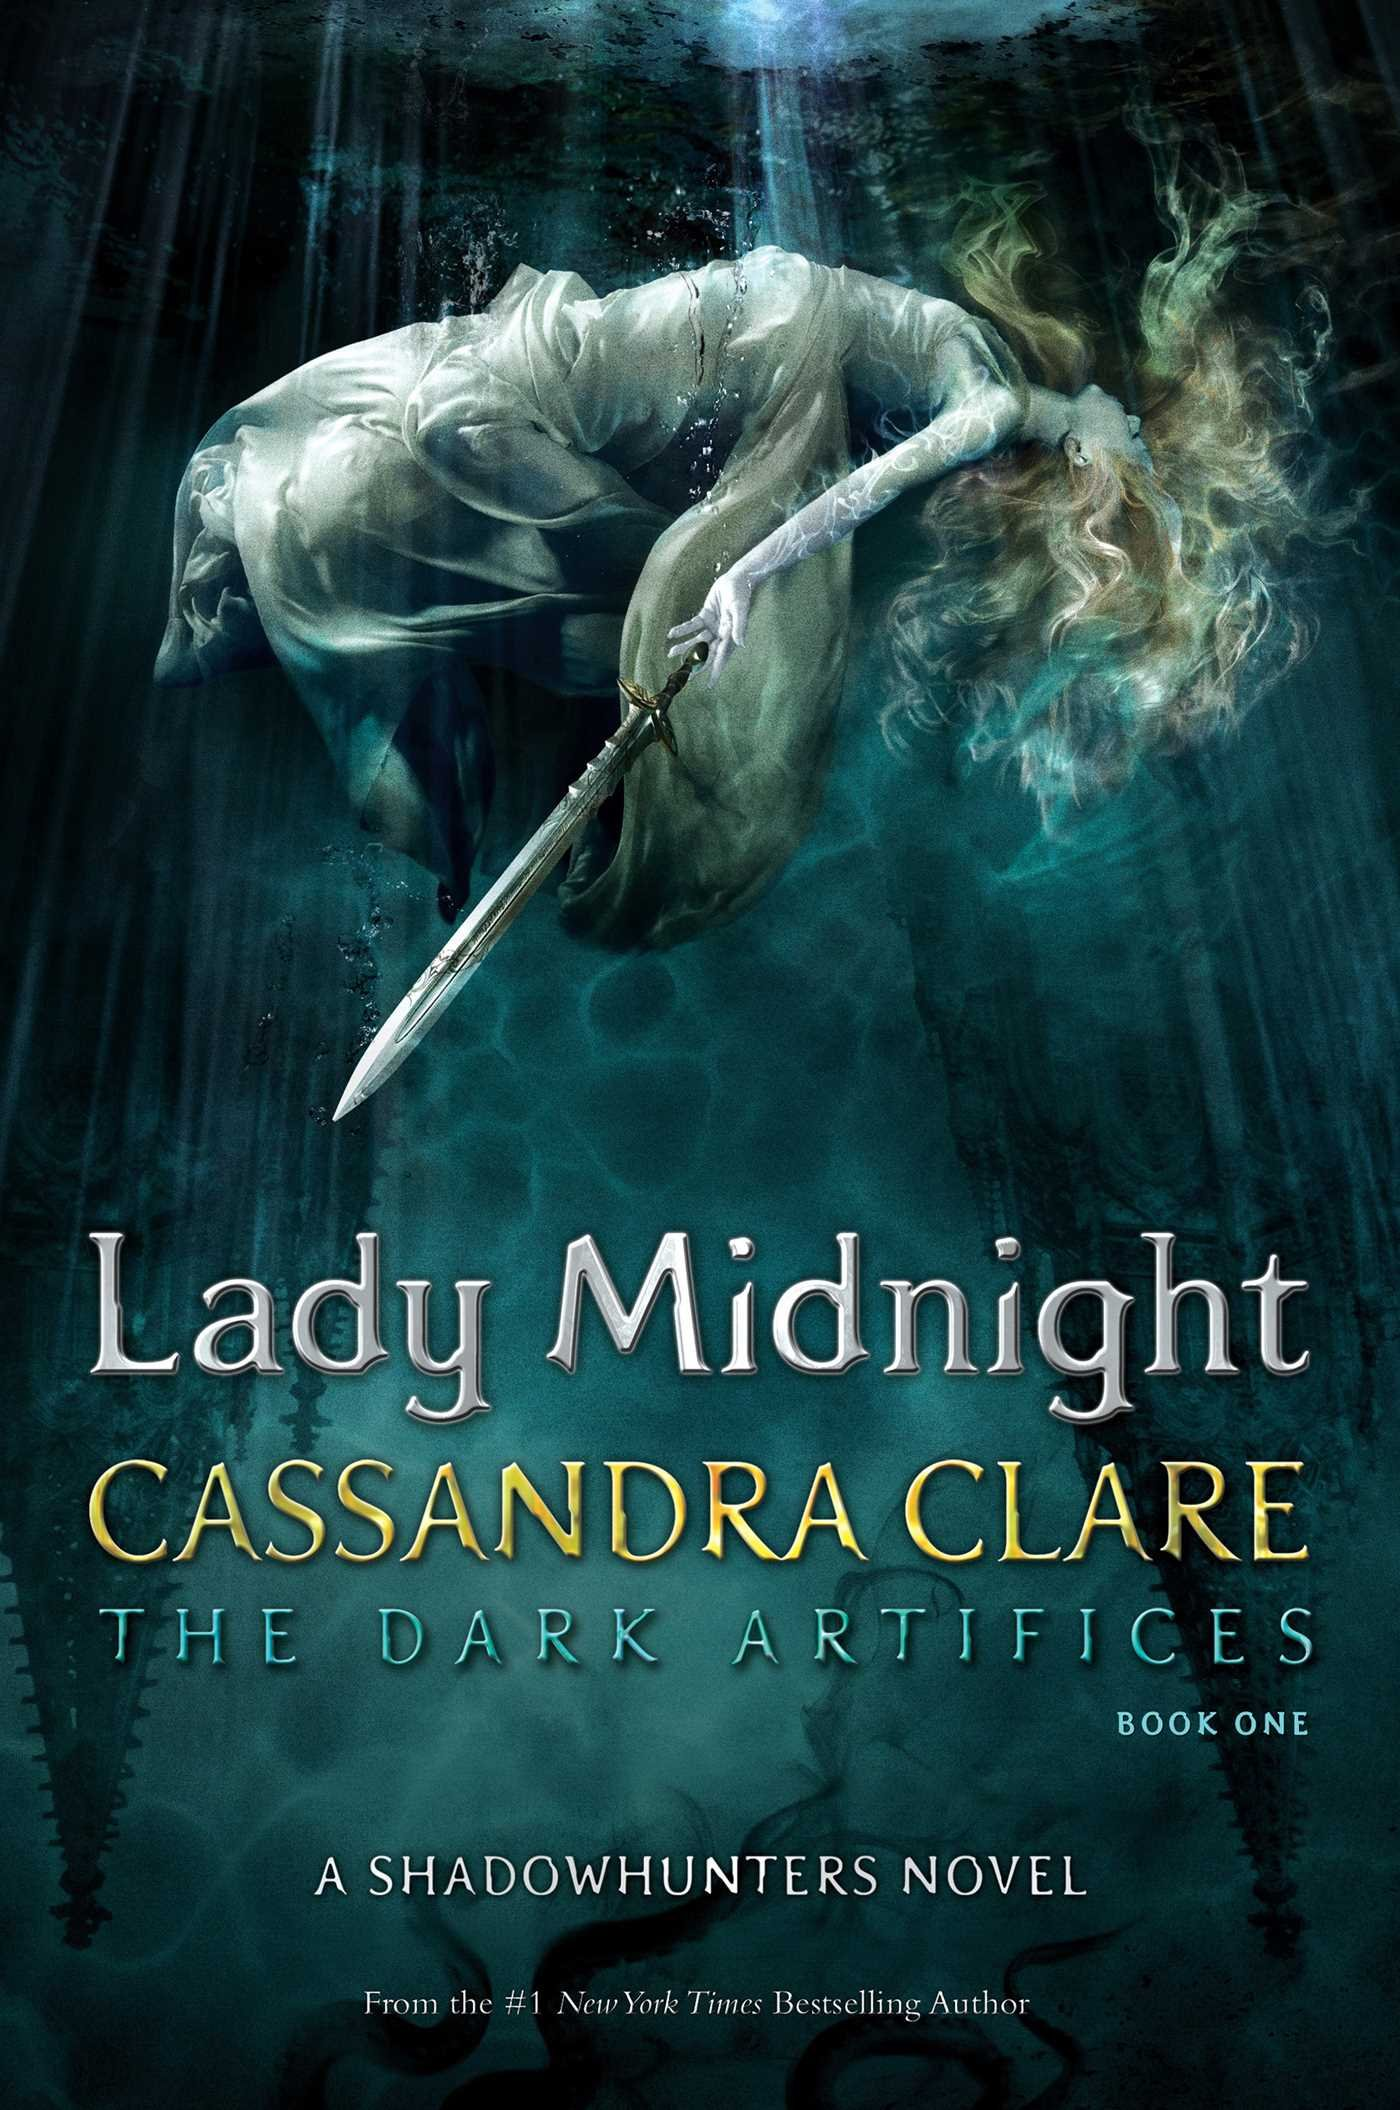 Lady Midnight by Cassandra Clare